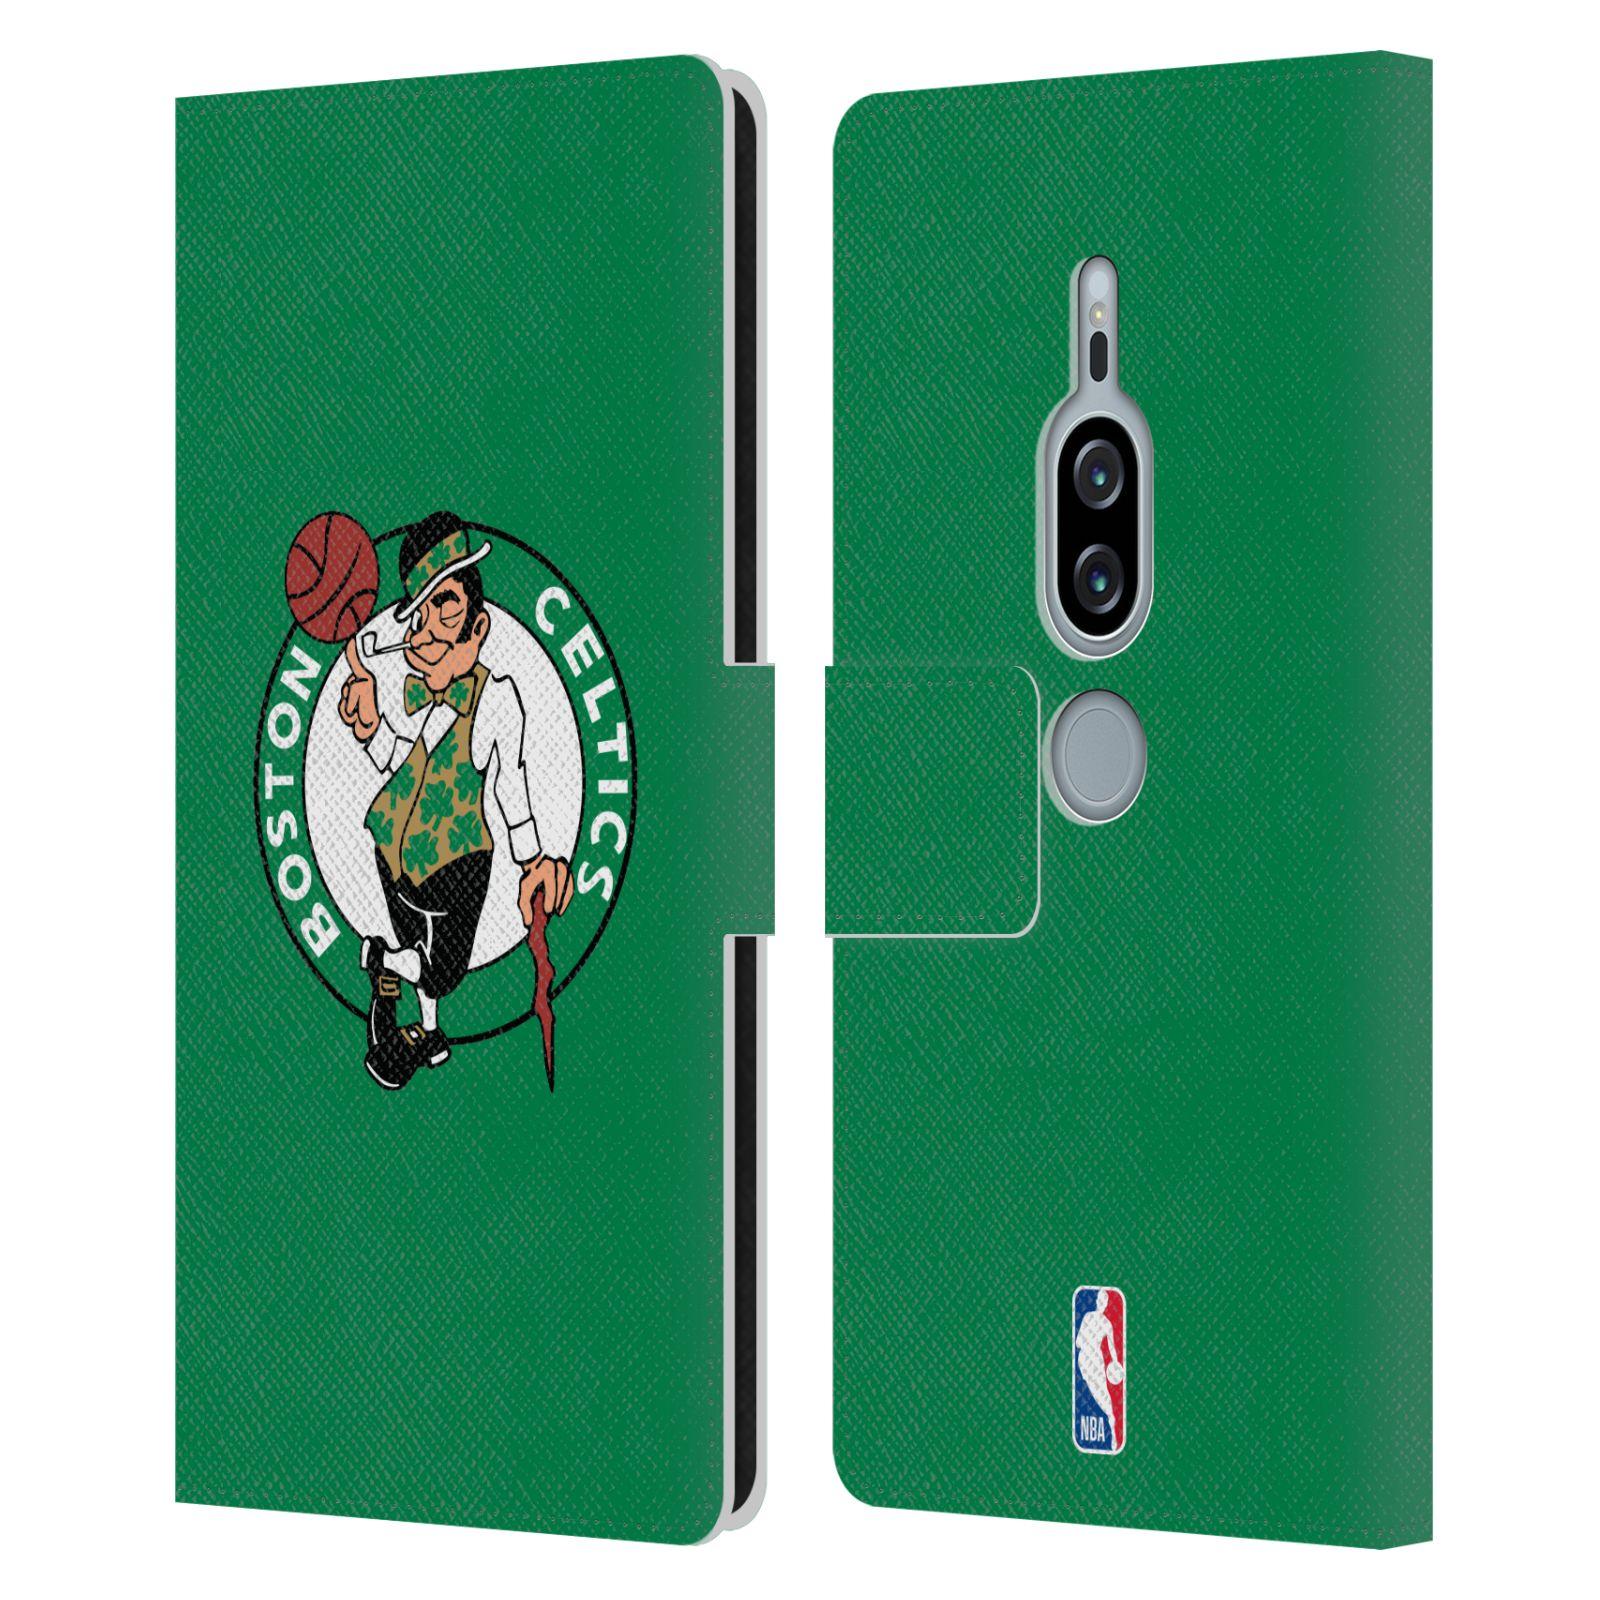 Pouzdro na mobil Sony Xperia XZ2 Premium - Head Case - NBA - Boston Celtics zelená barva znak